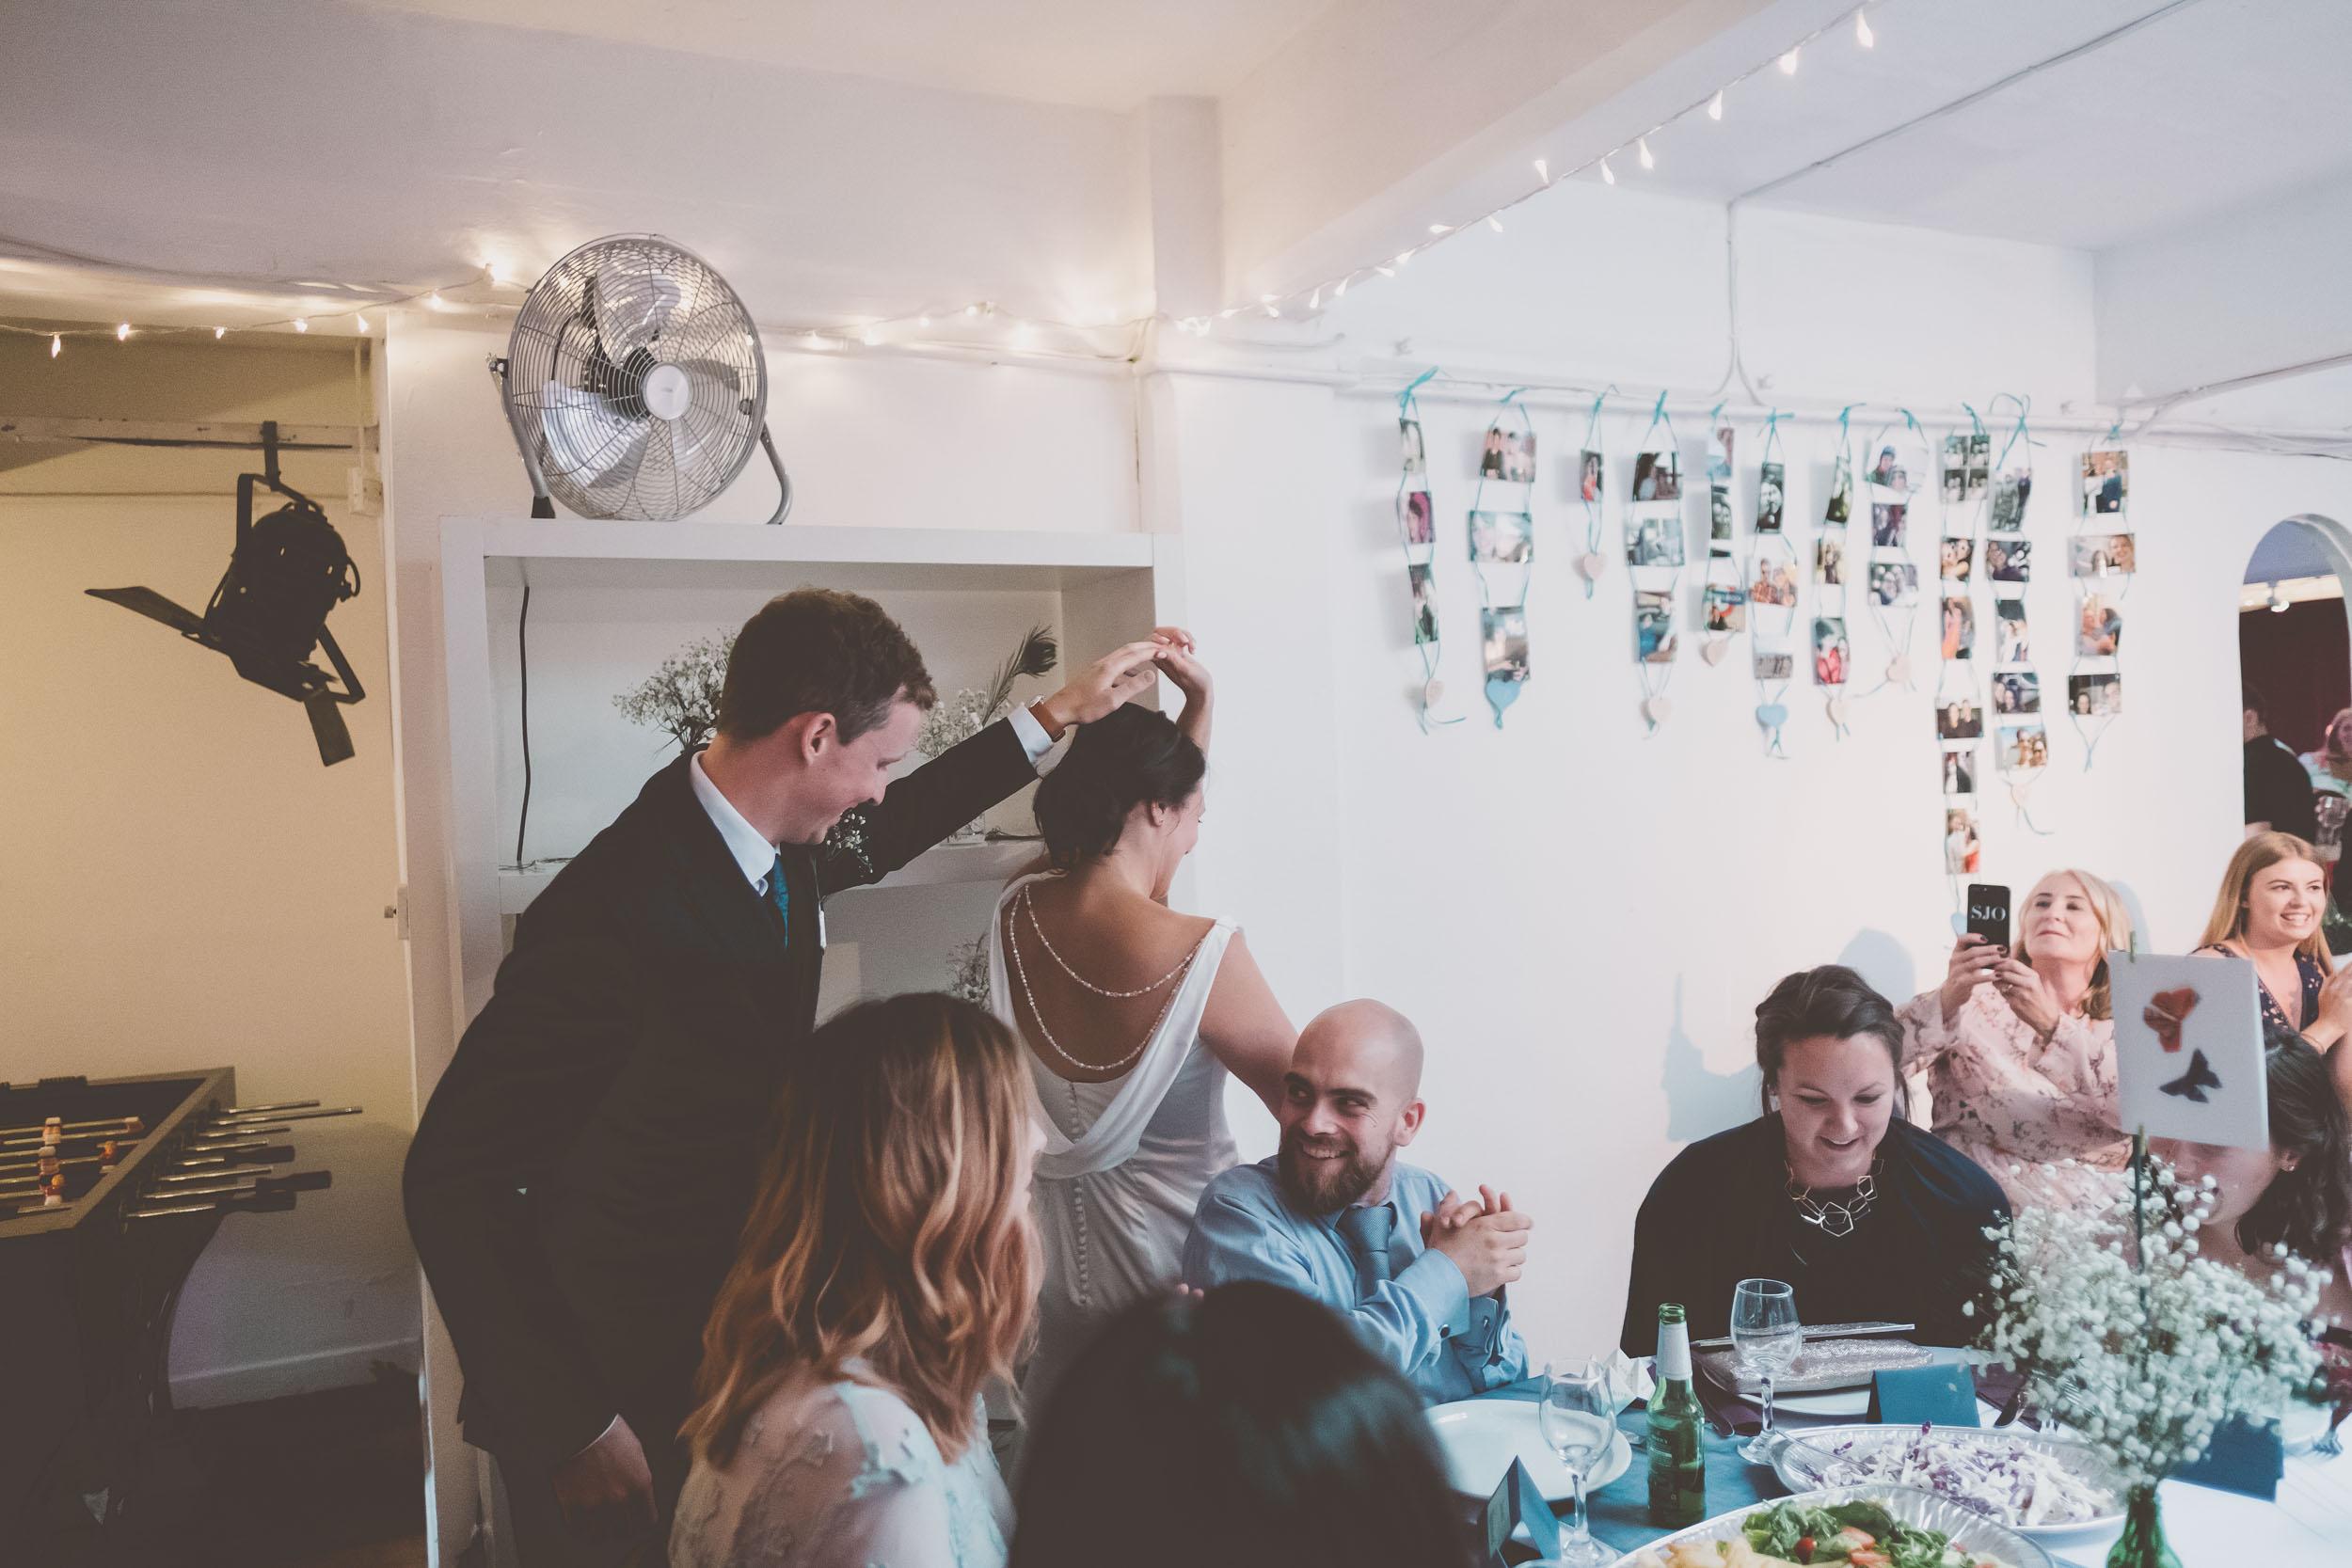 islington-town-hall-4th-floor-studios-wedding345.jpg